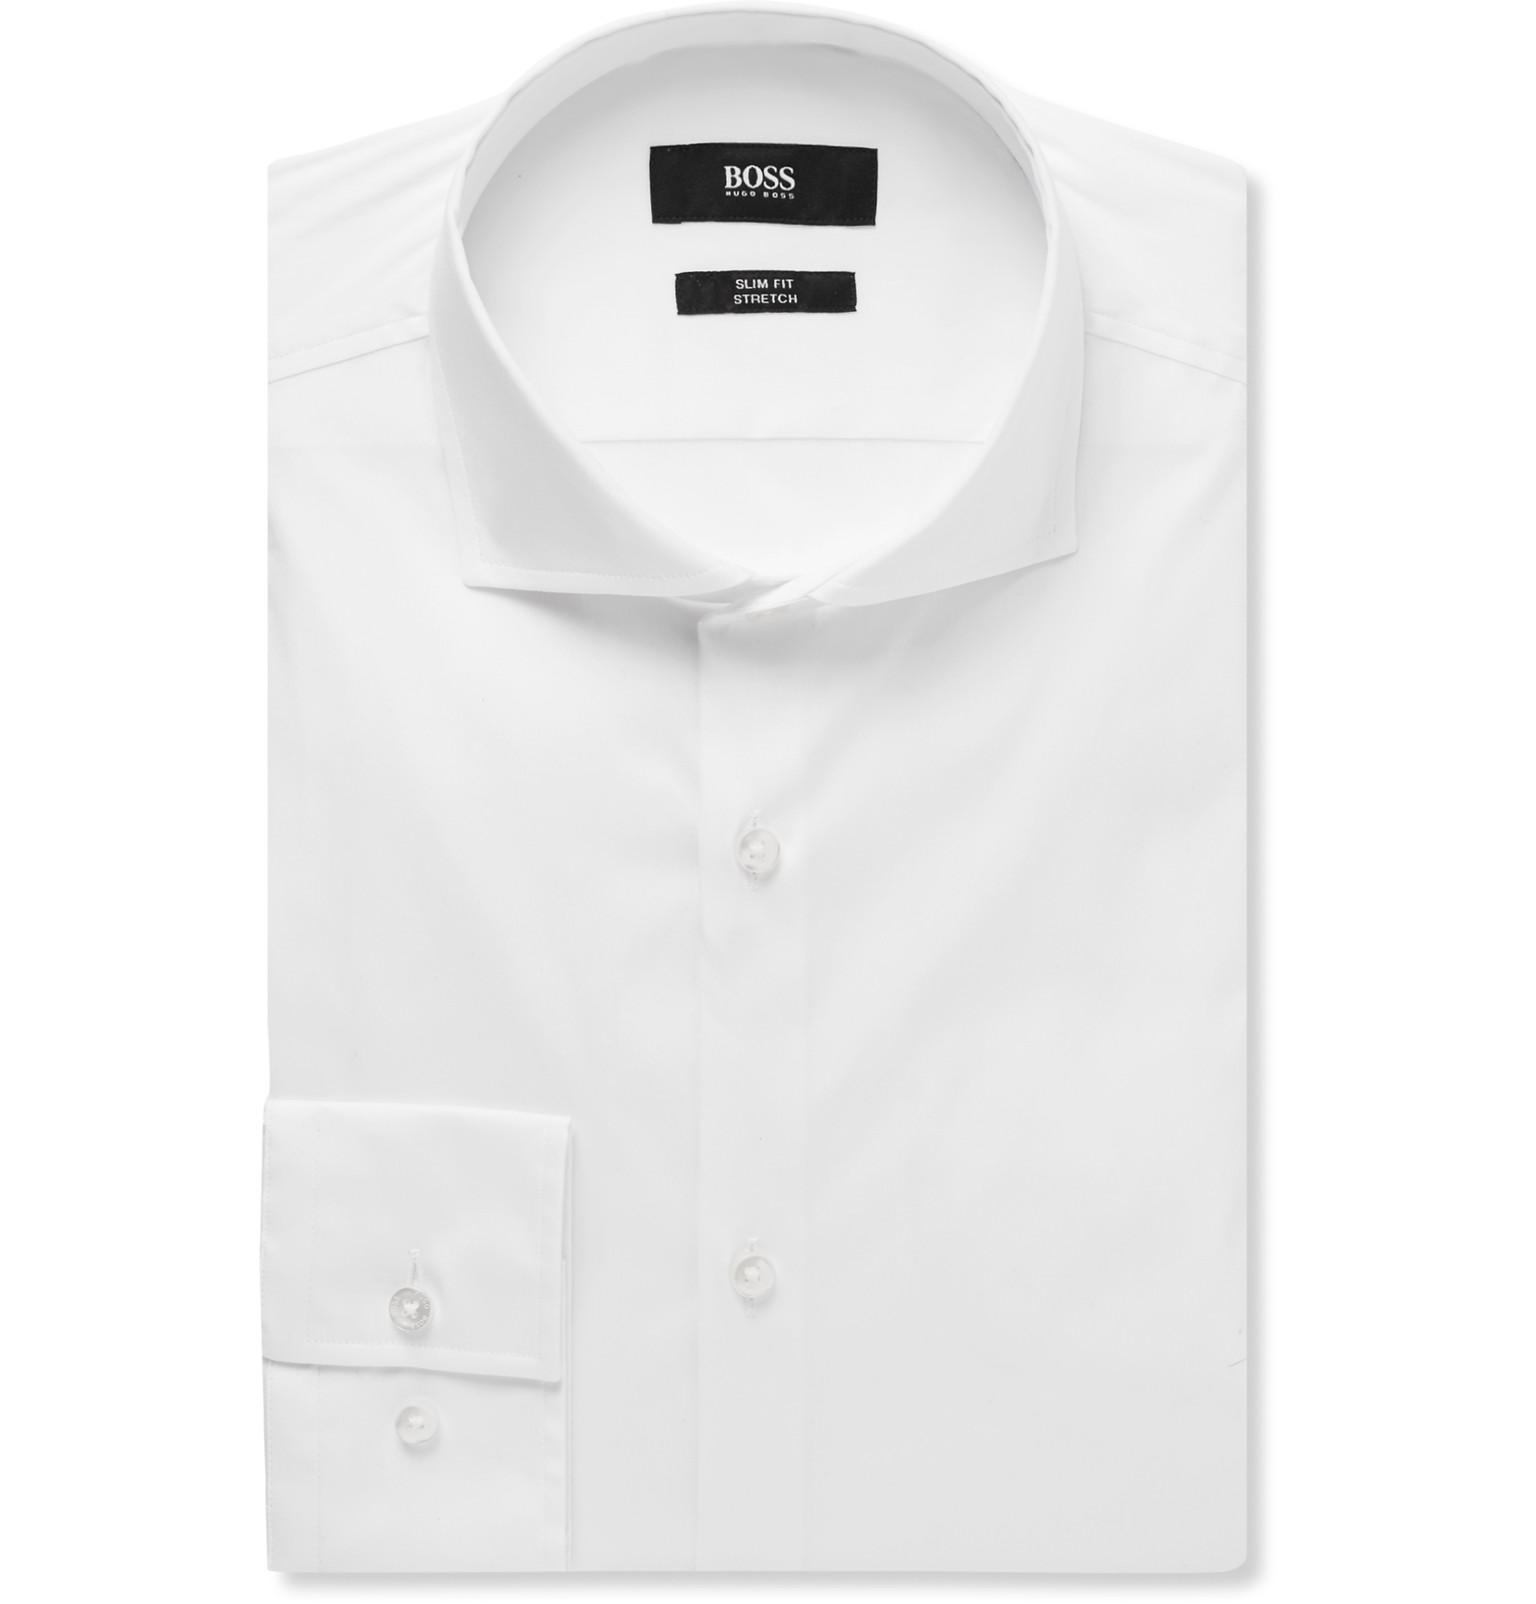 aacdb972 Hugo Boss Slim Fit Dress Shirt White - DREAMWORKS